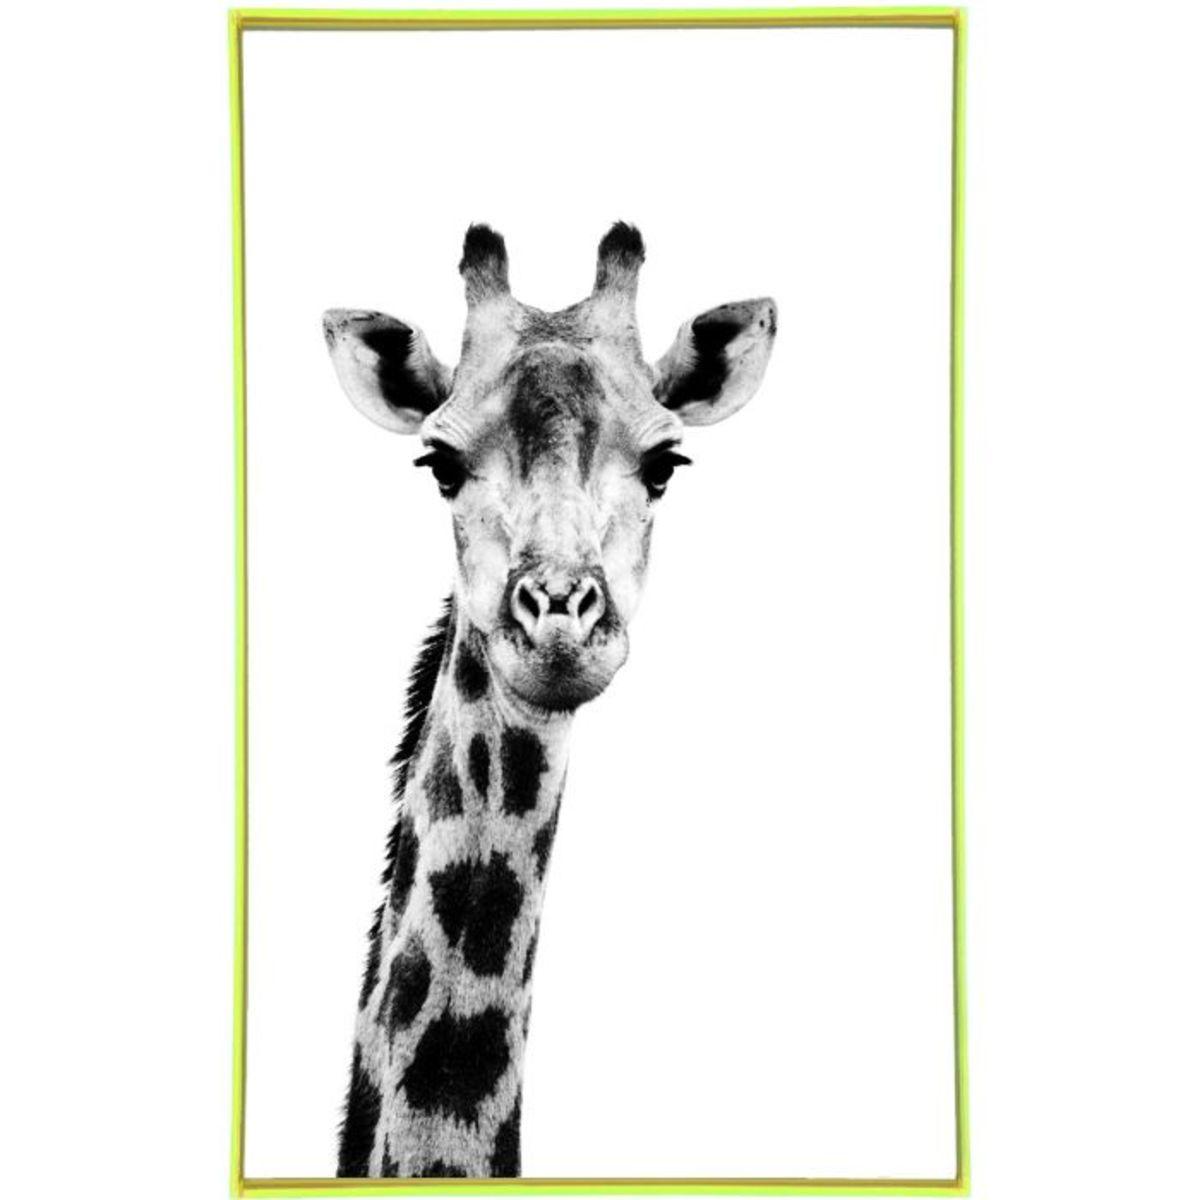 Fudje frame it black and white giraffe print on canvas for Best black and white prints